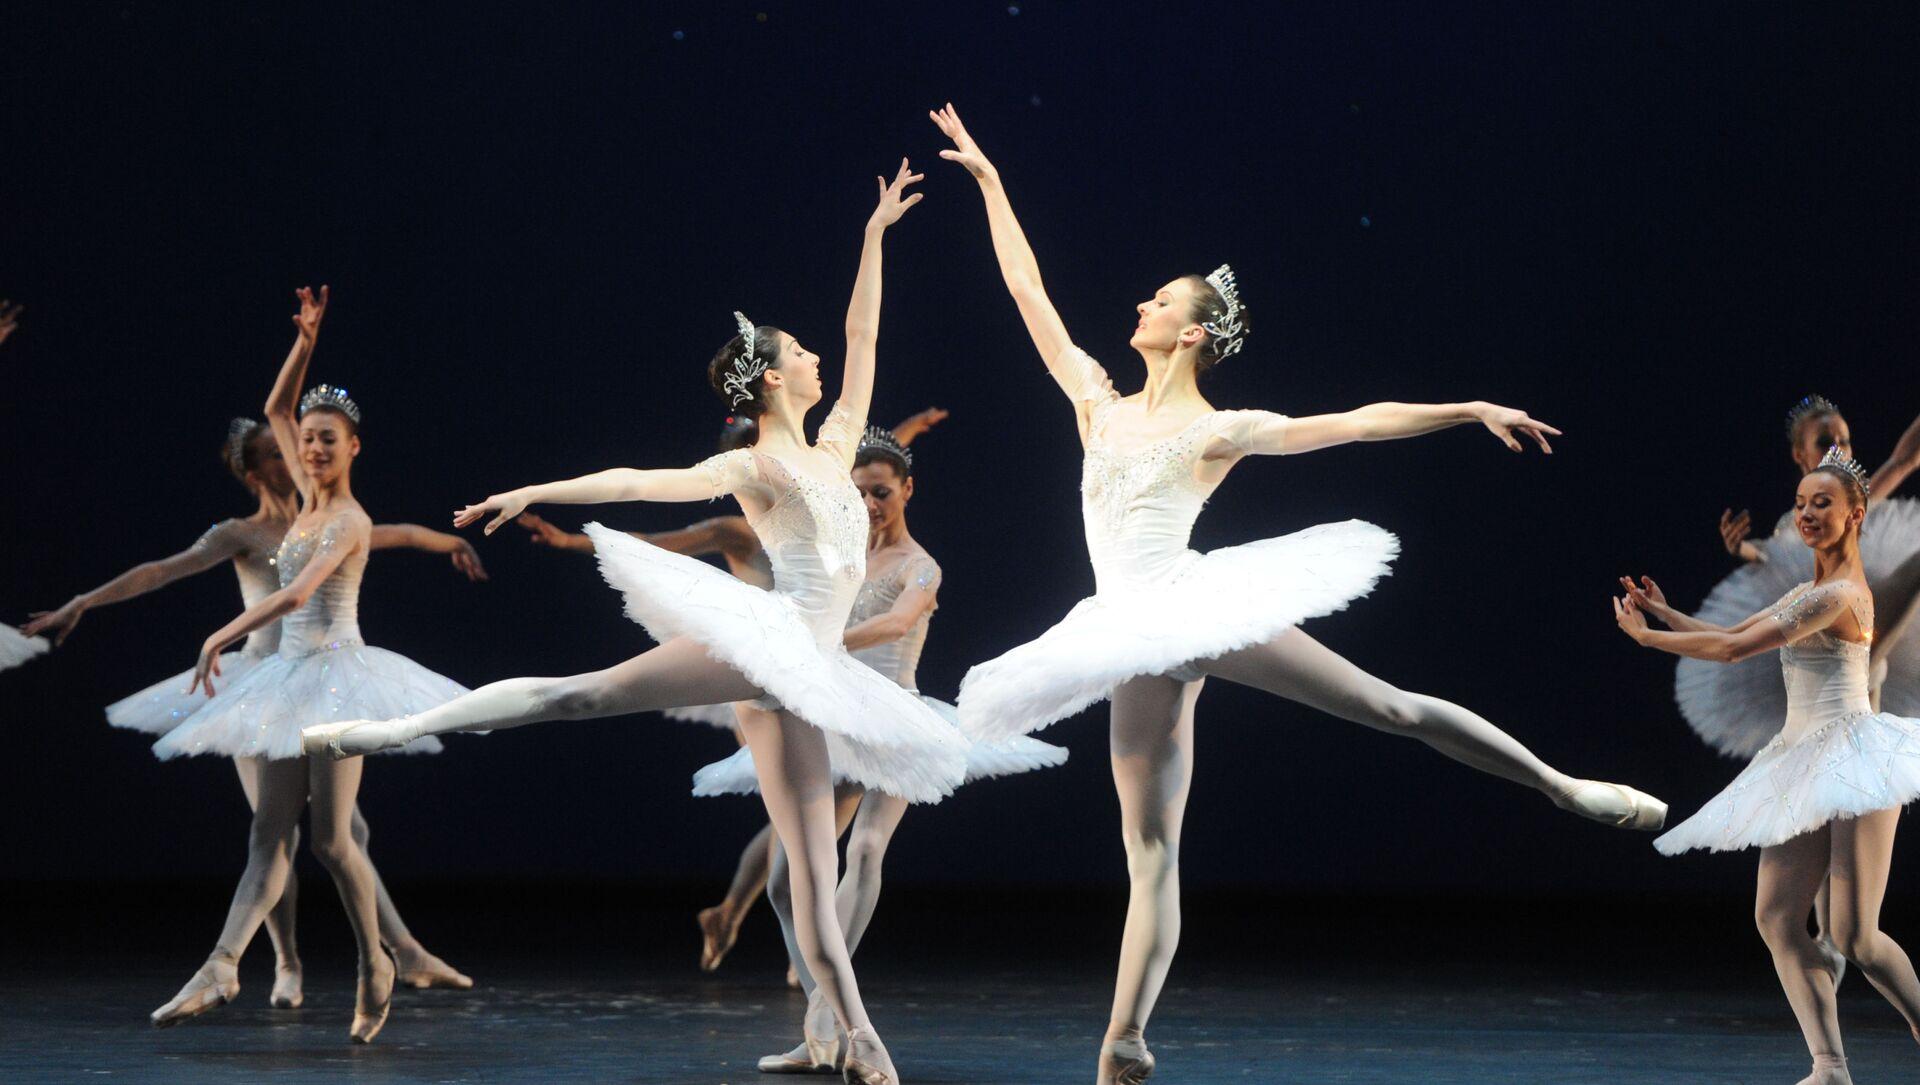 Сцена из балета Джорджа Баланчина - Sputnik Грузия, 1920, 10.06.2021